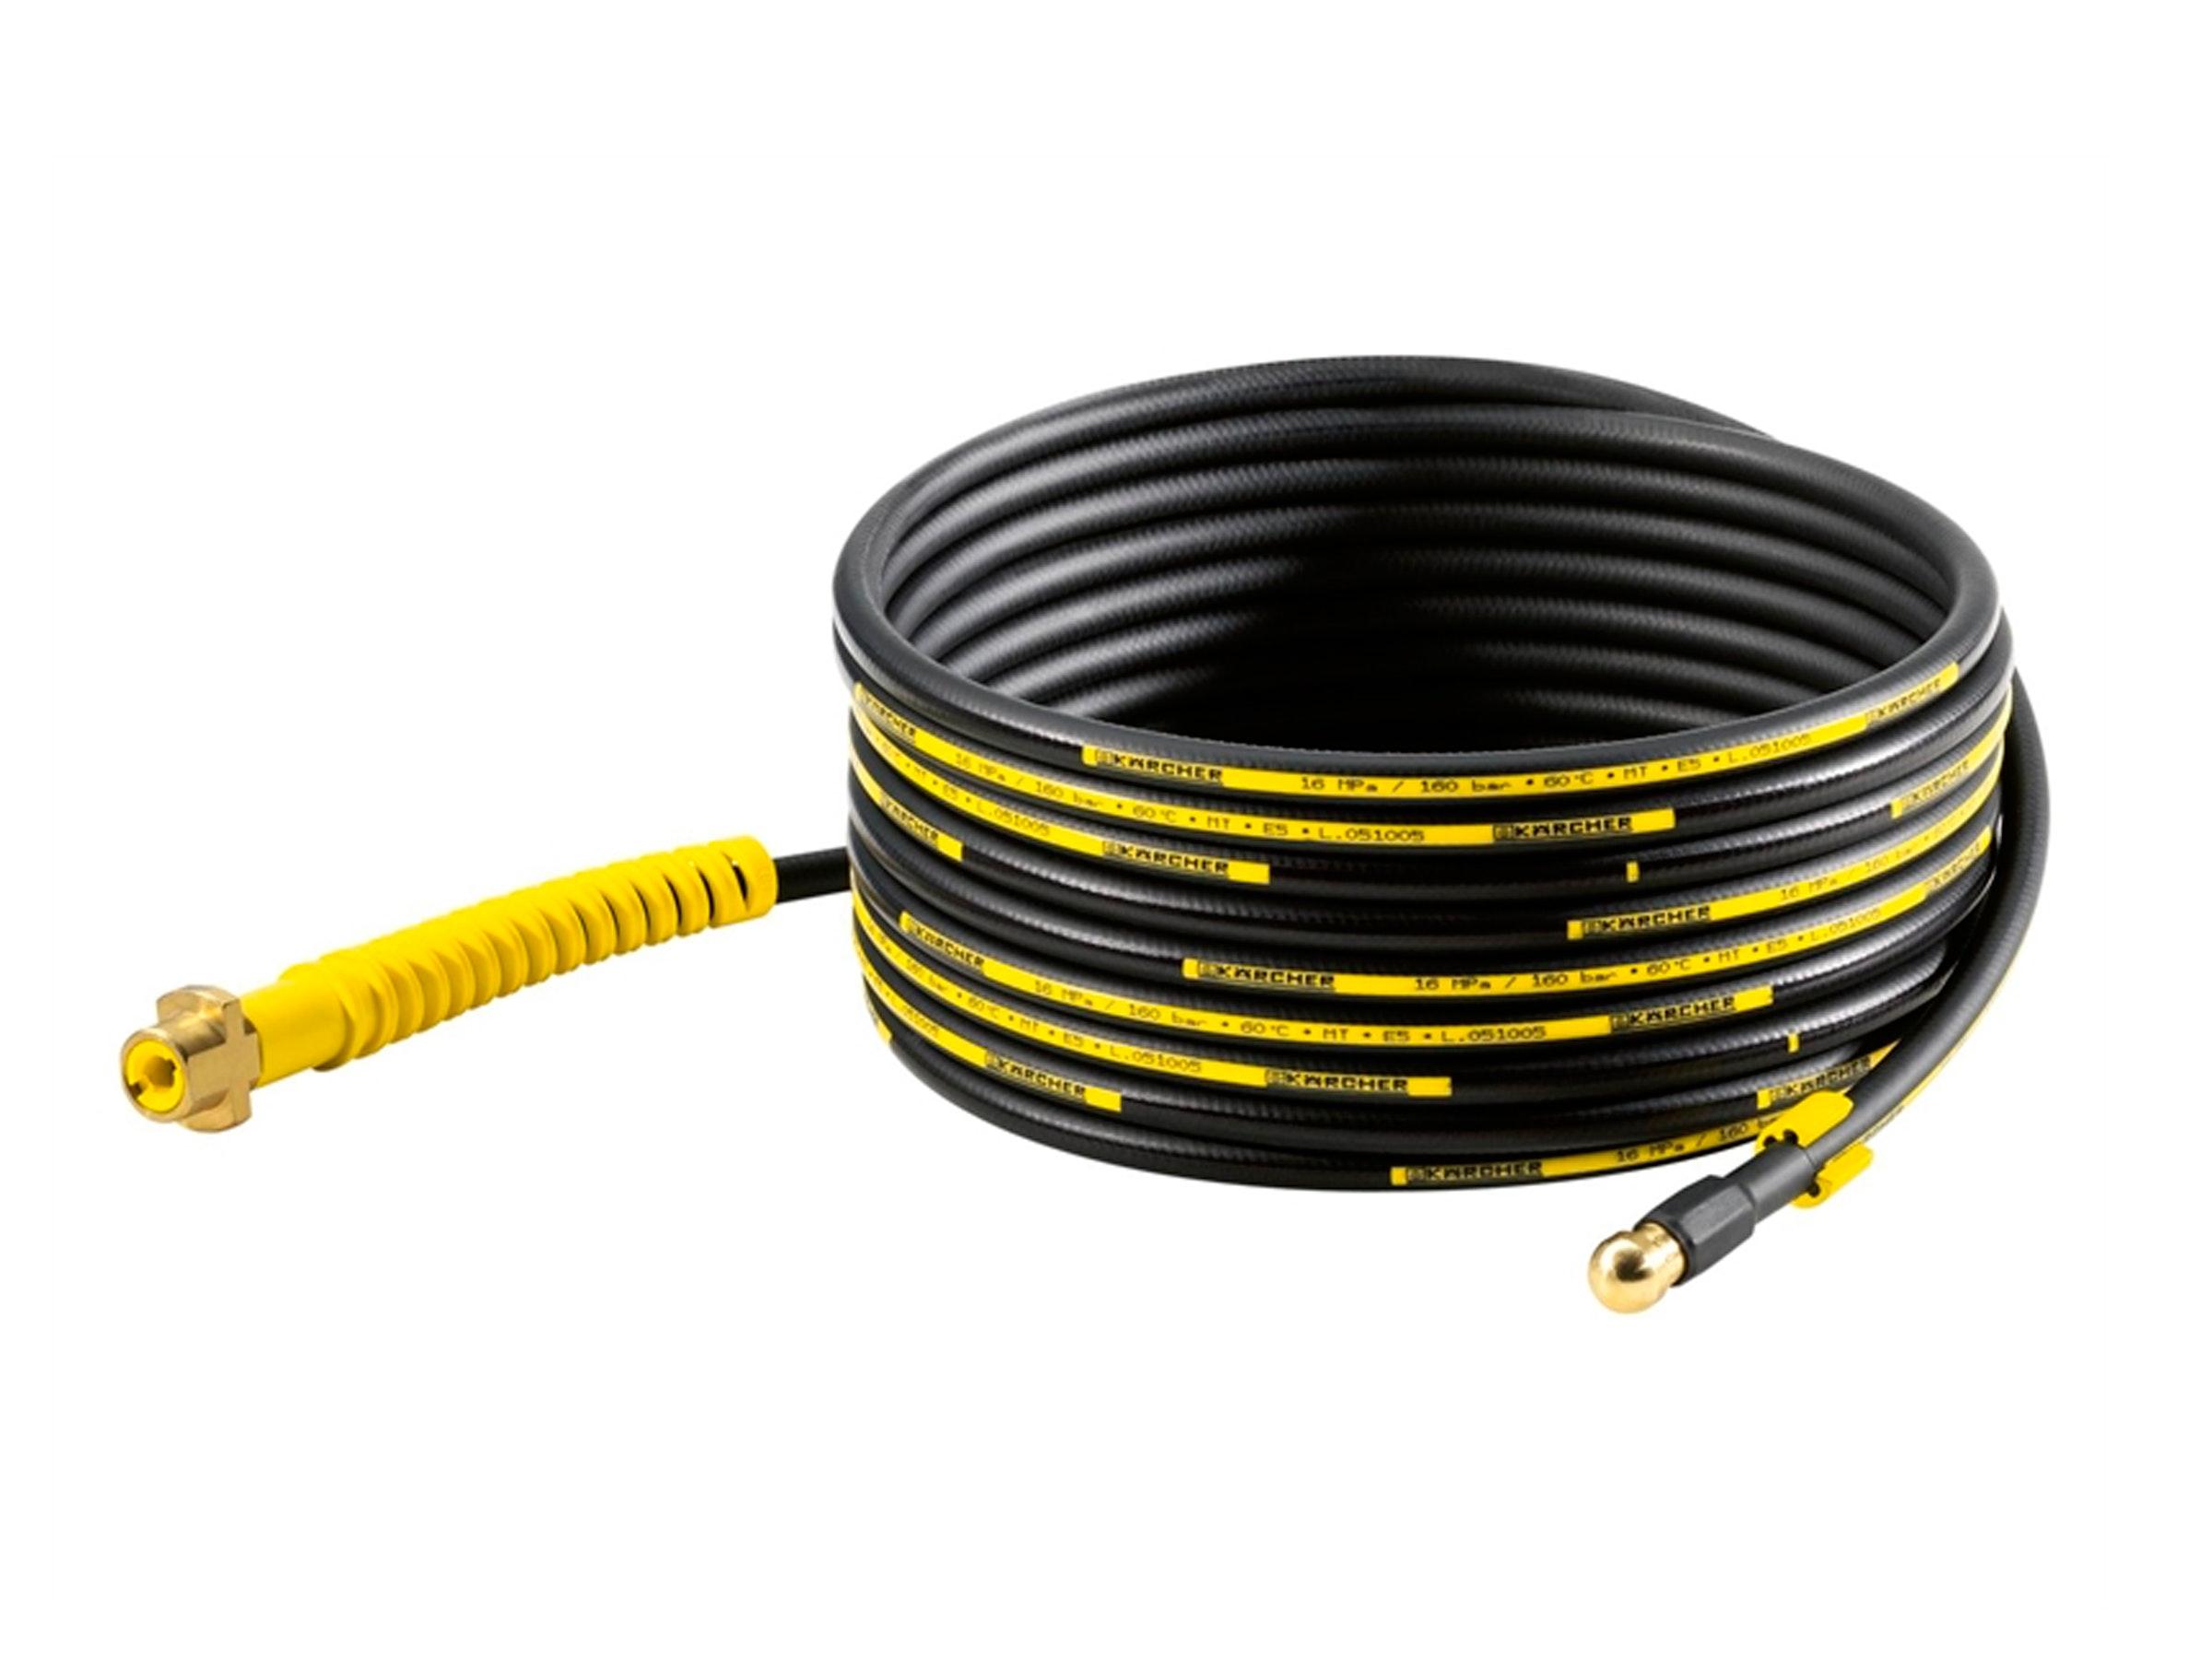 Karcher Pipe Cleaning Kit 7.5m K2-K7